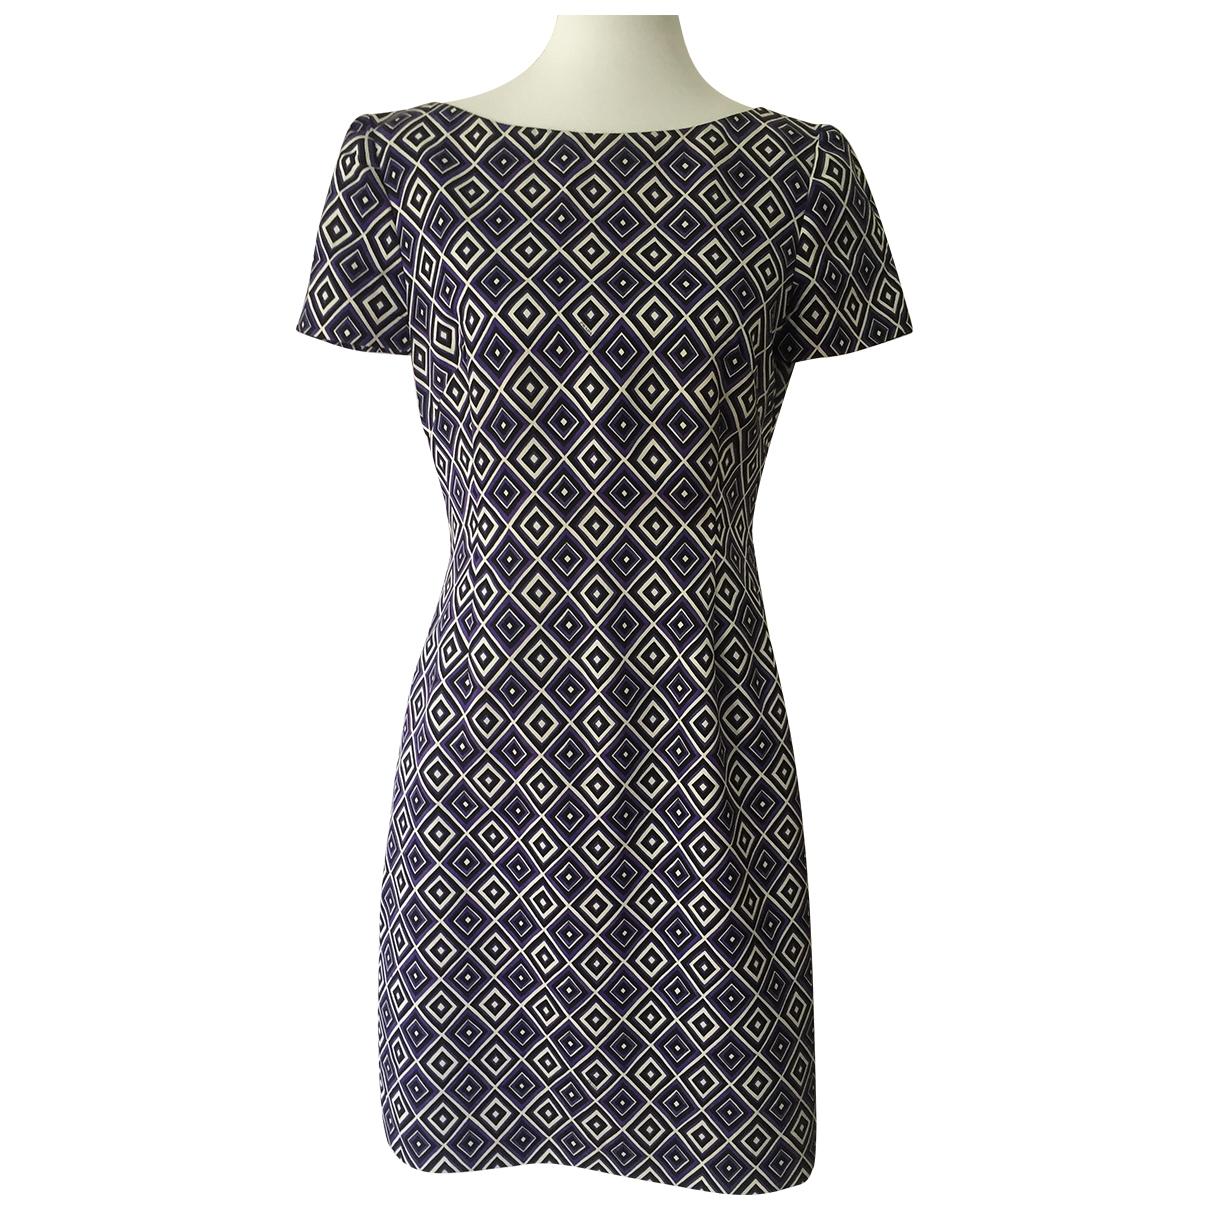 Prada \N Purple Cotton dress for Women 44 IT